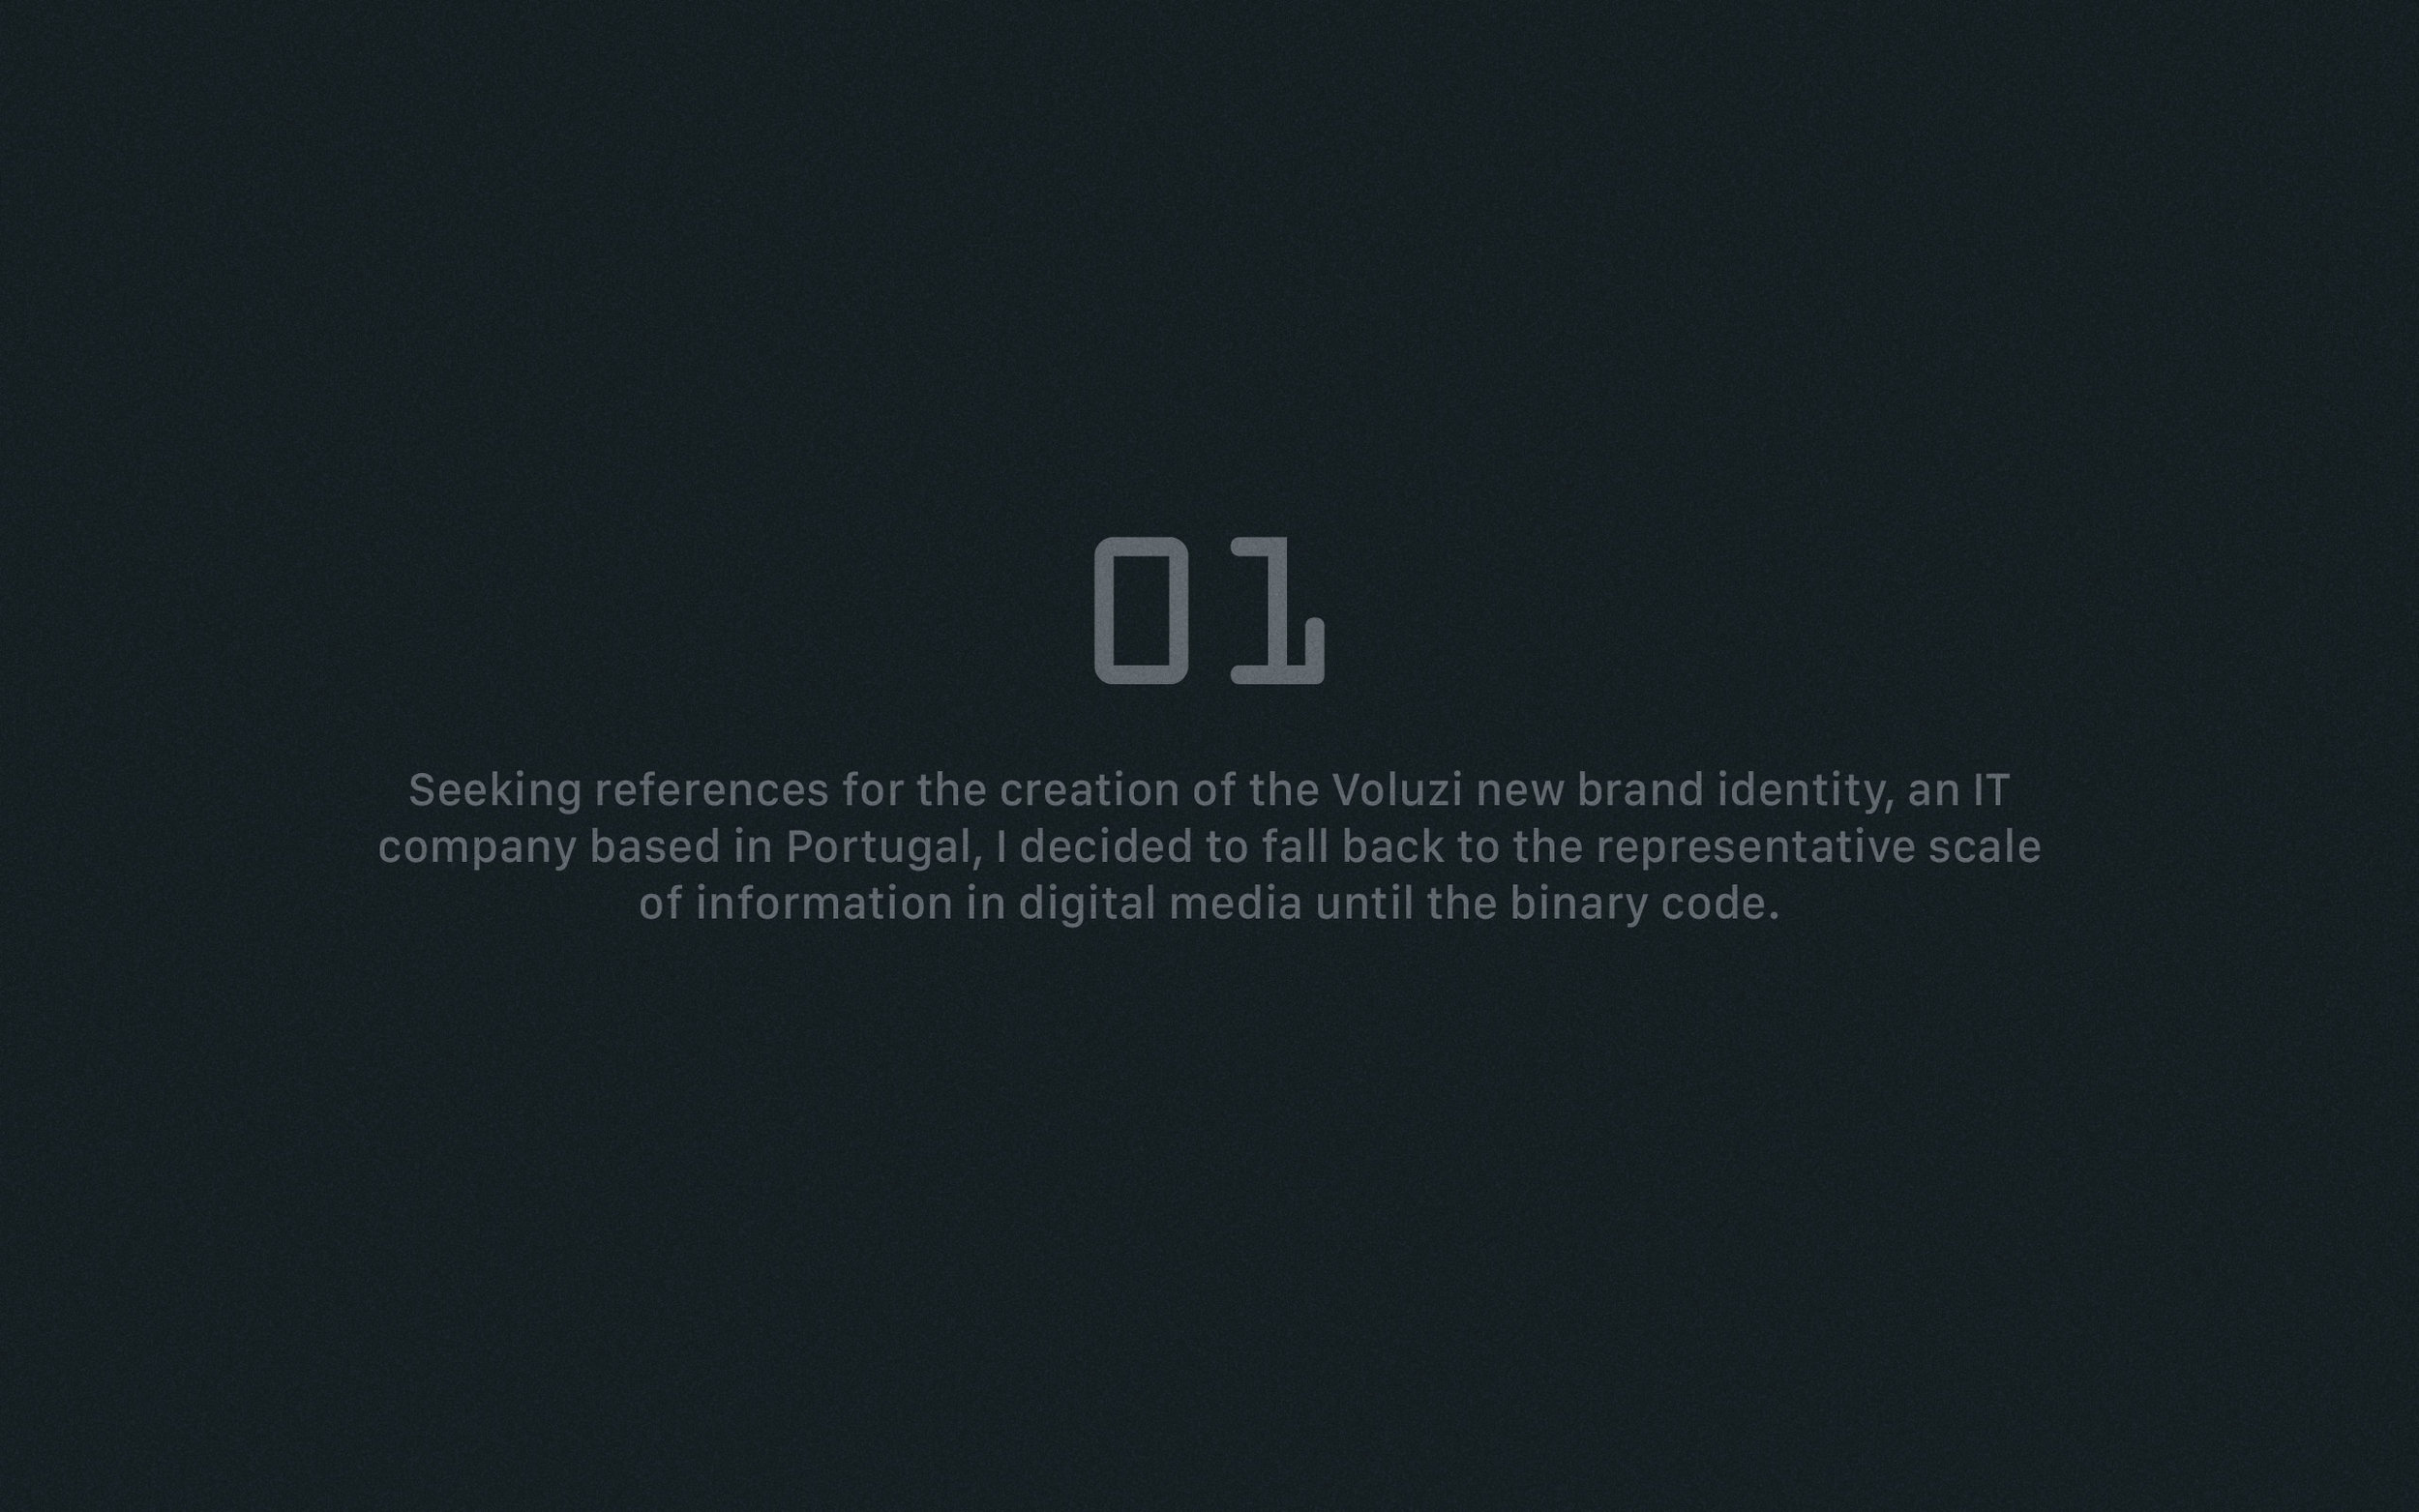 Rafael Maia - Voluzi Corporate Branding1.jpg